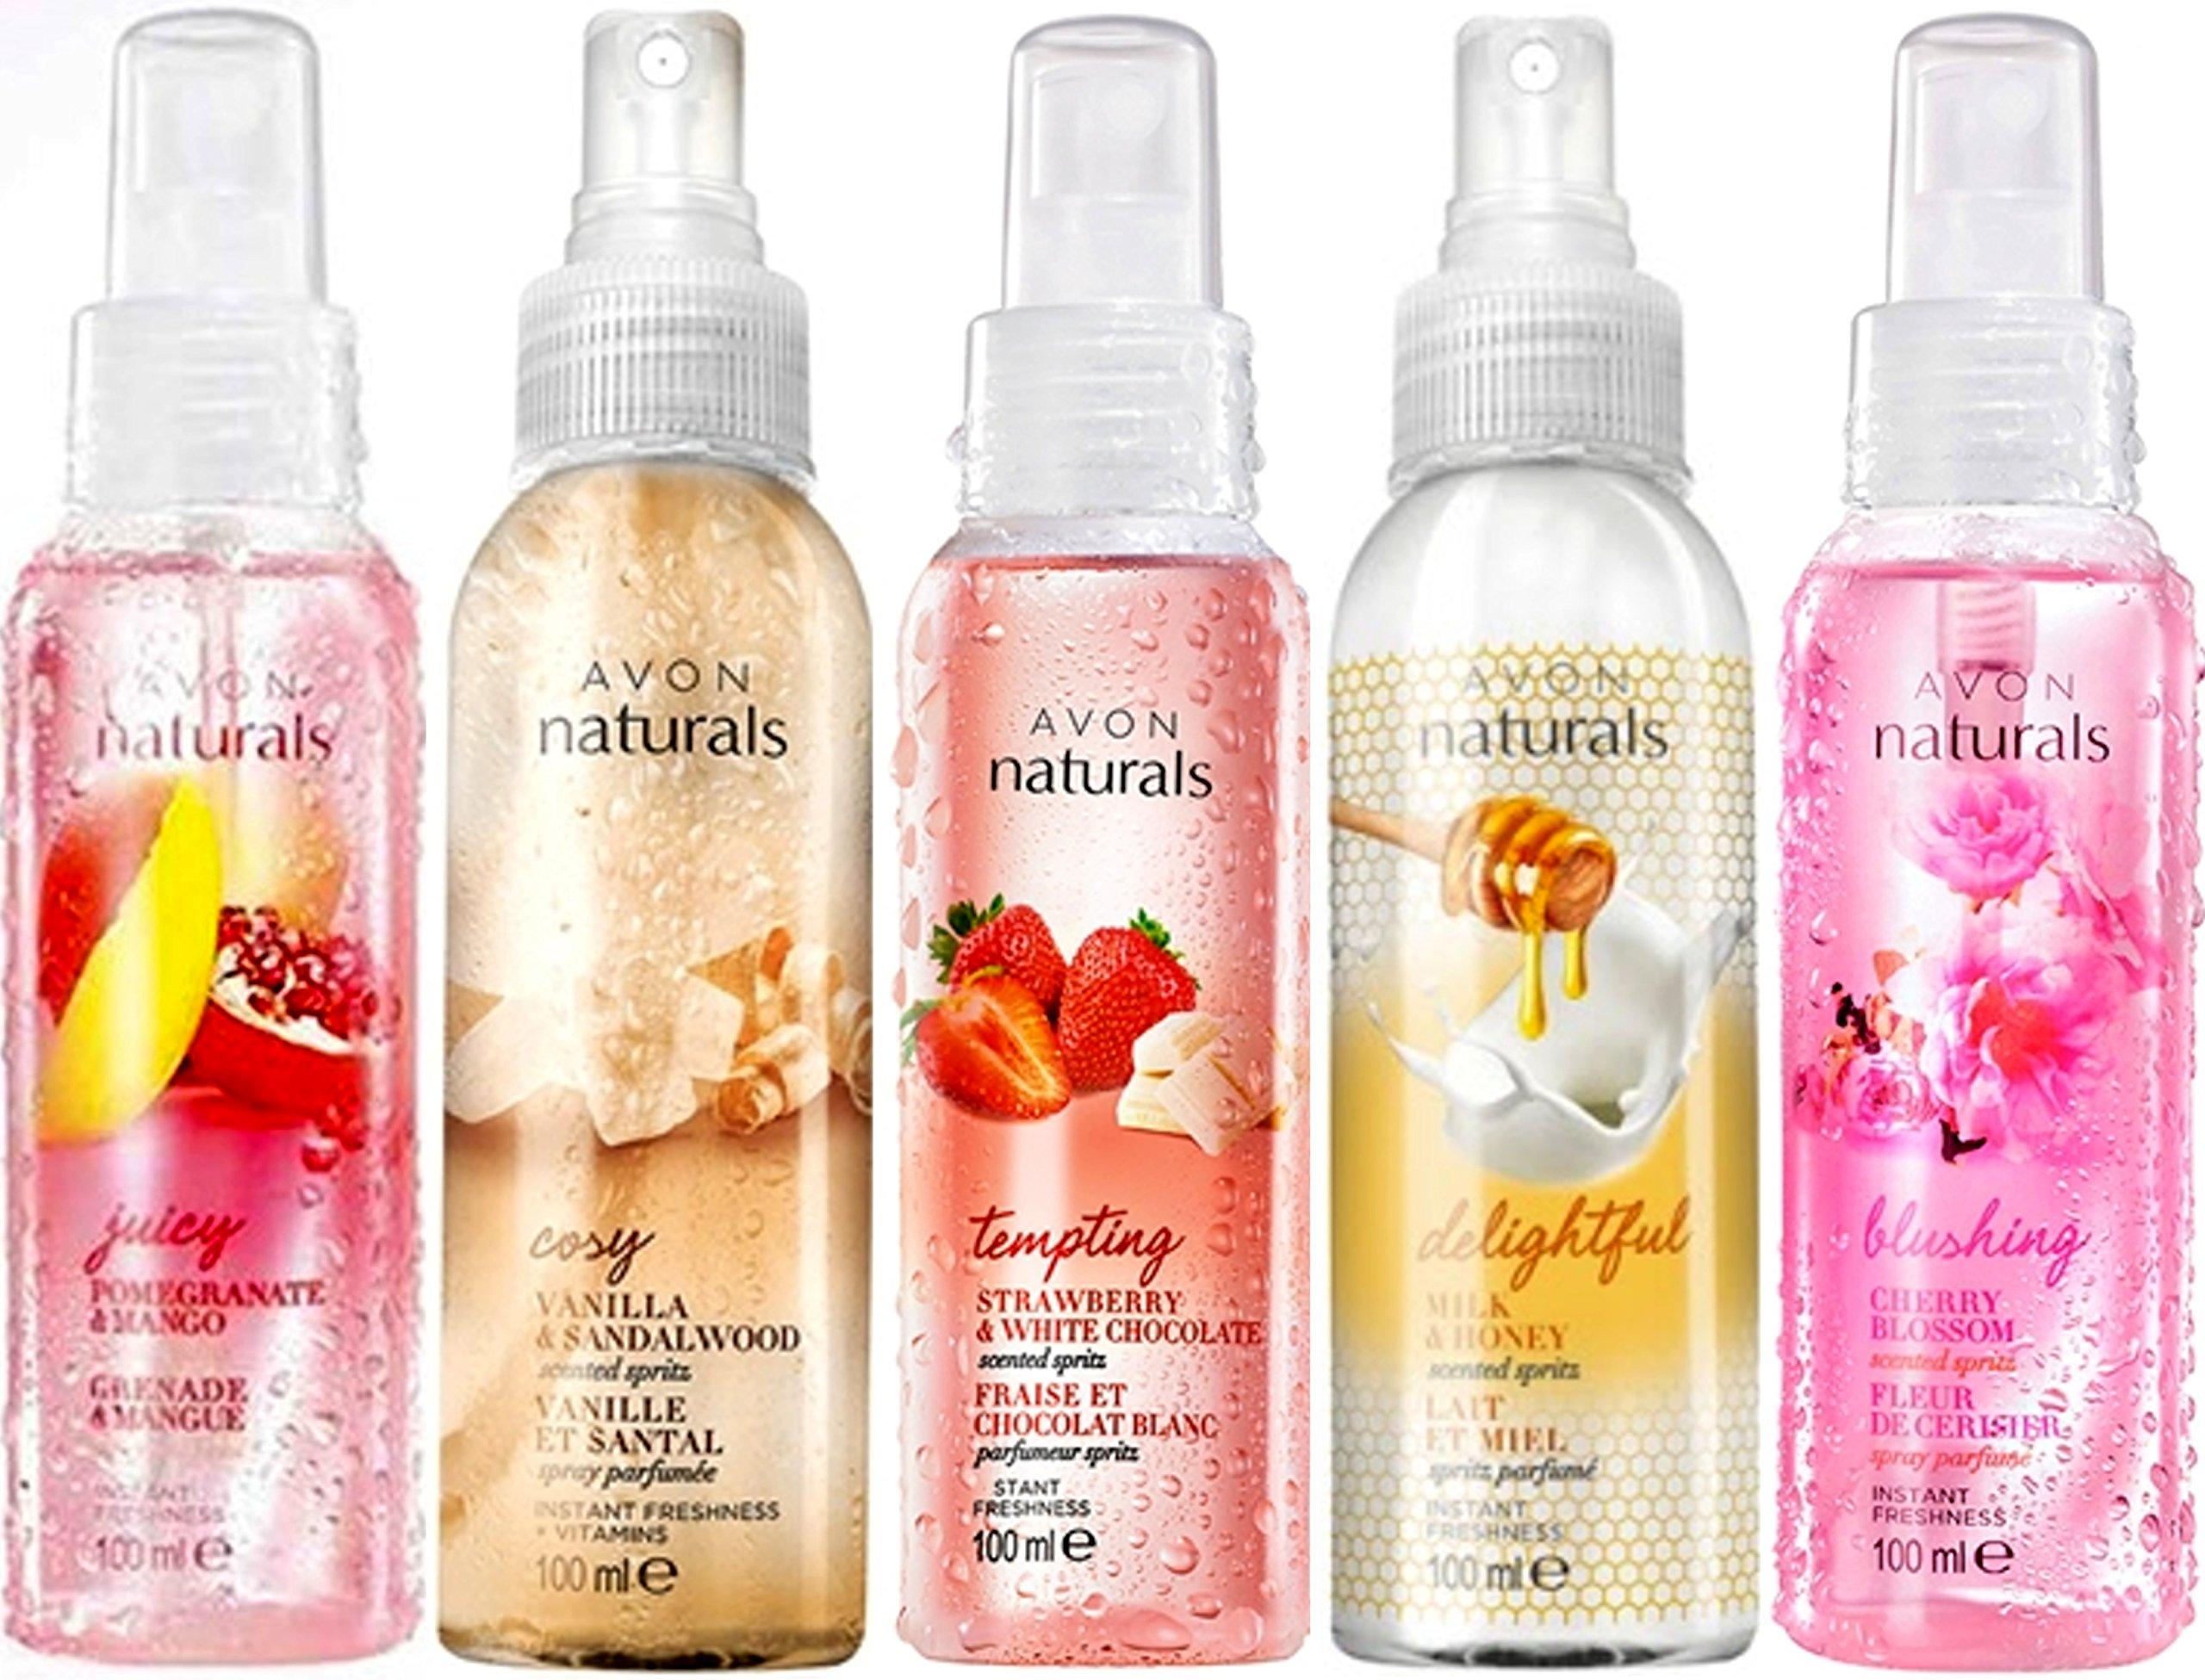 5 x Avon Naturals Body Spray Mix 5 x 100 ml - lucky dip